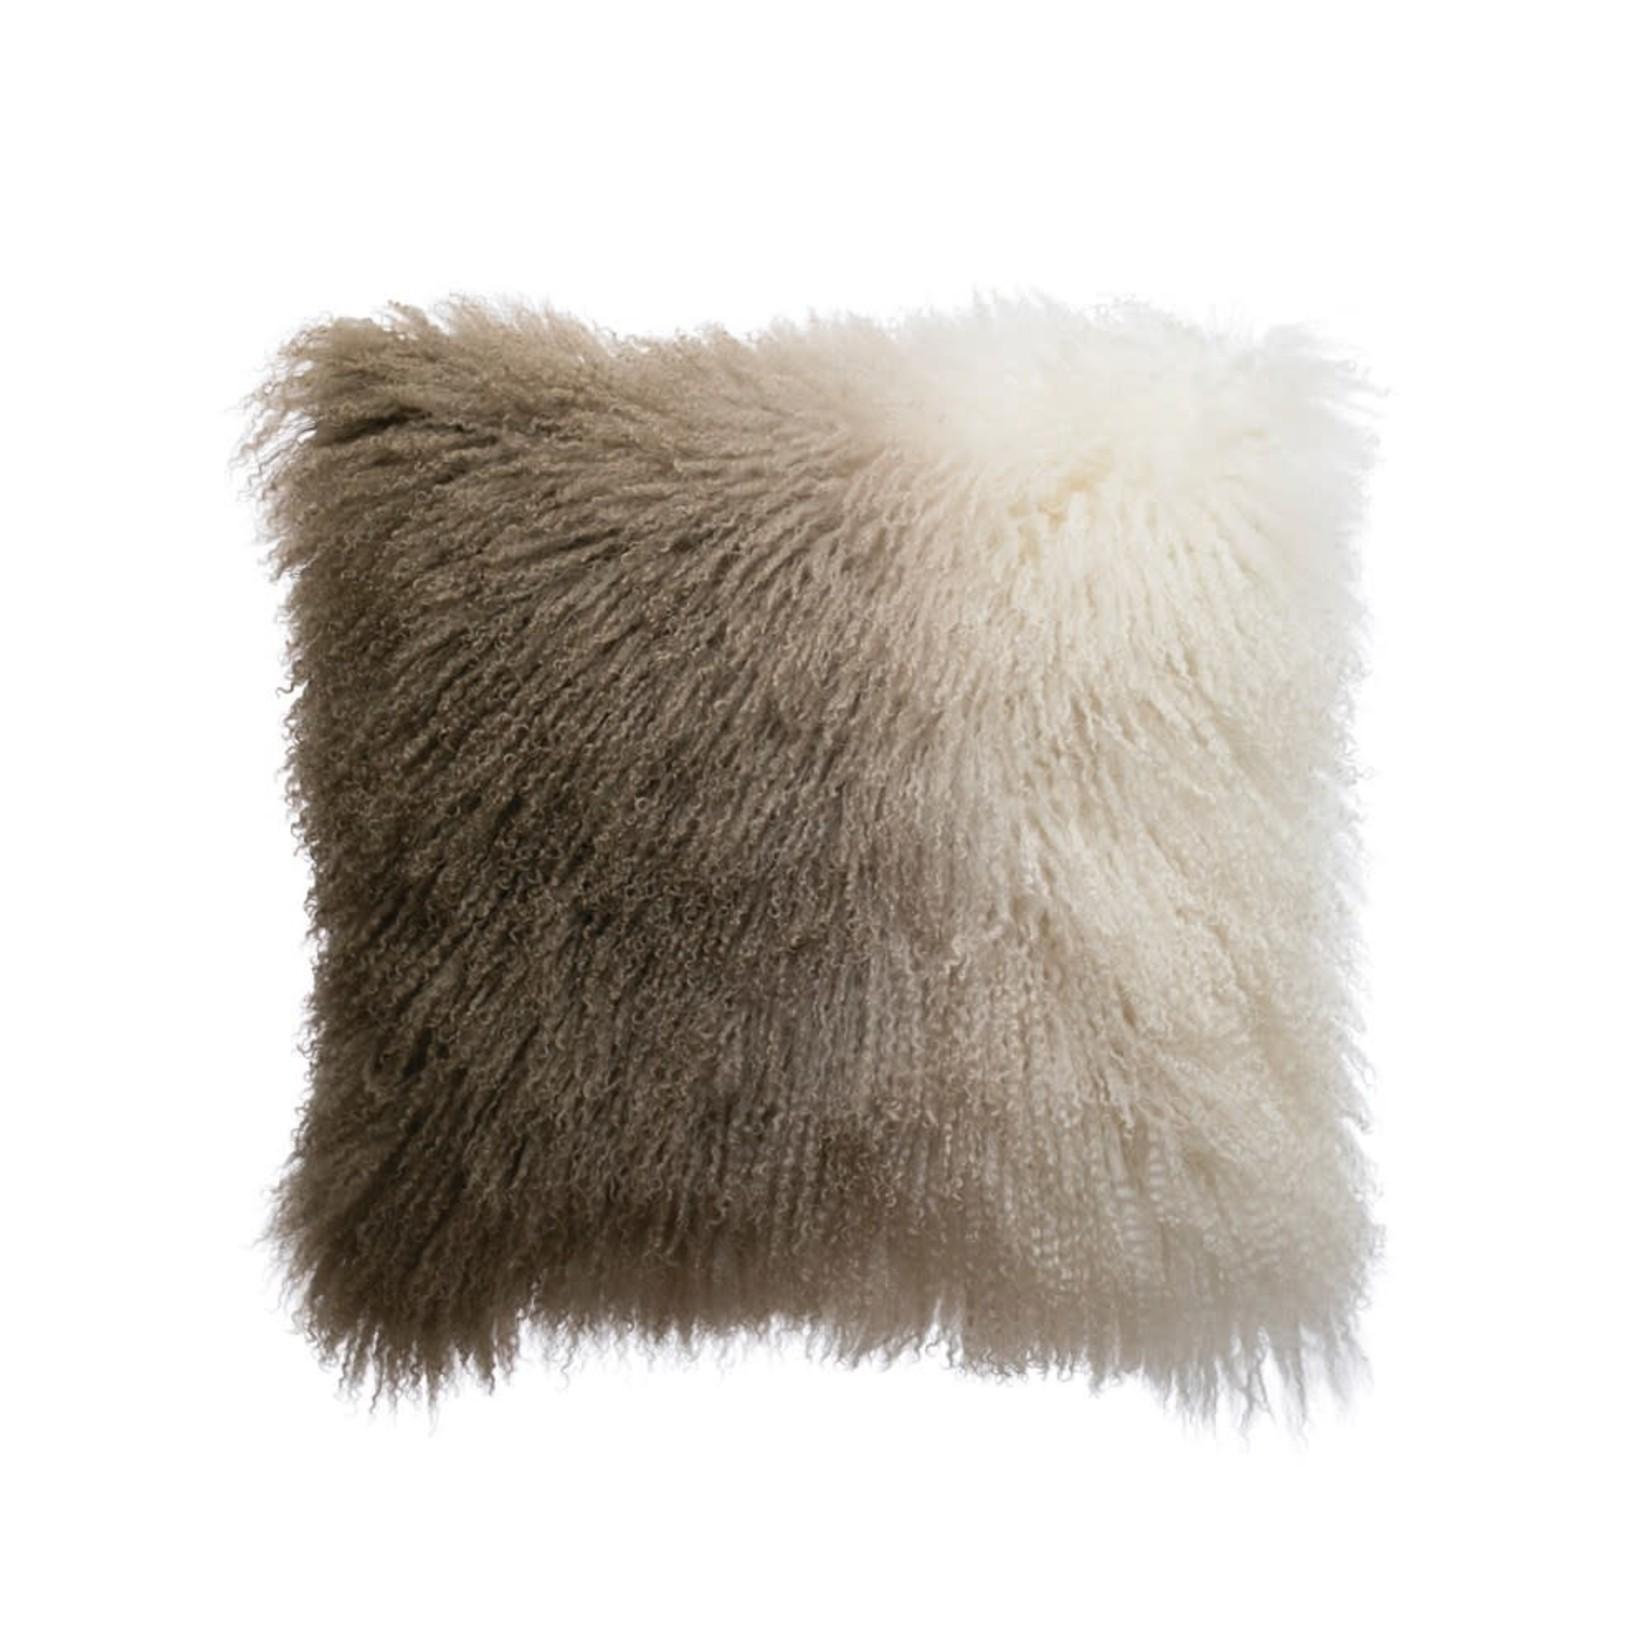 Ombre Mongolian Fur Pillow